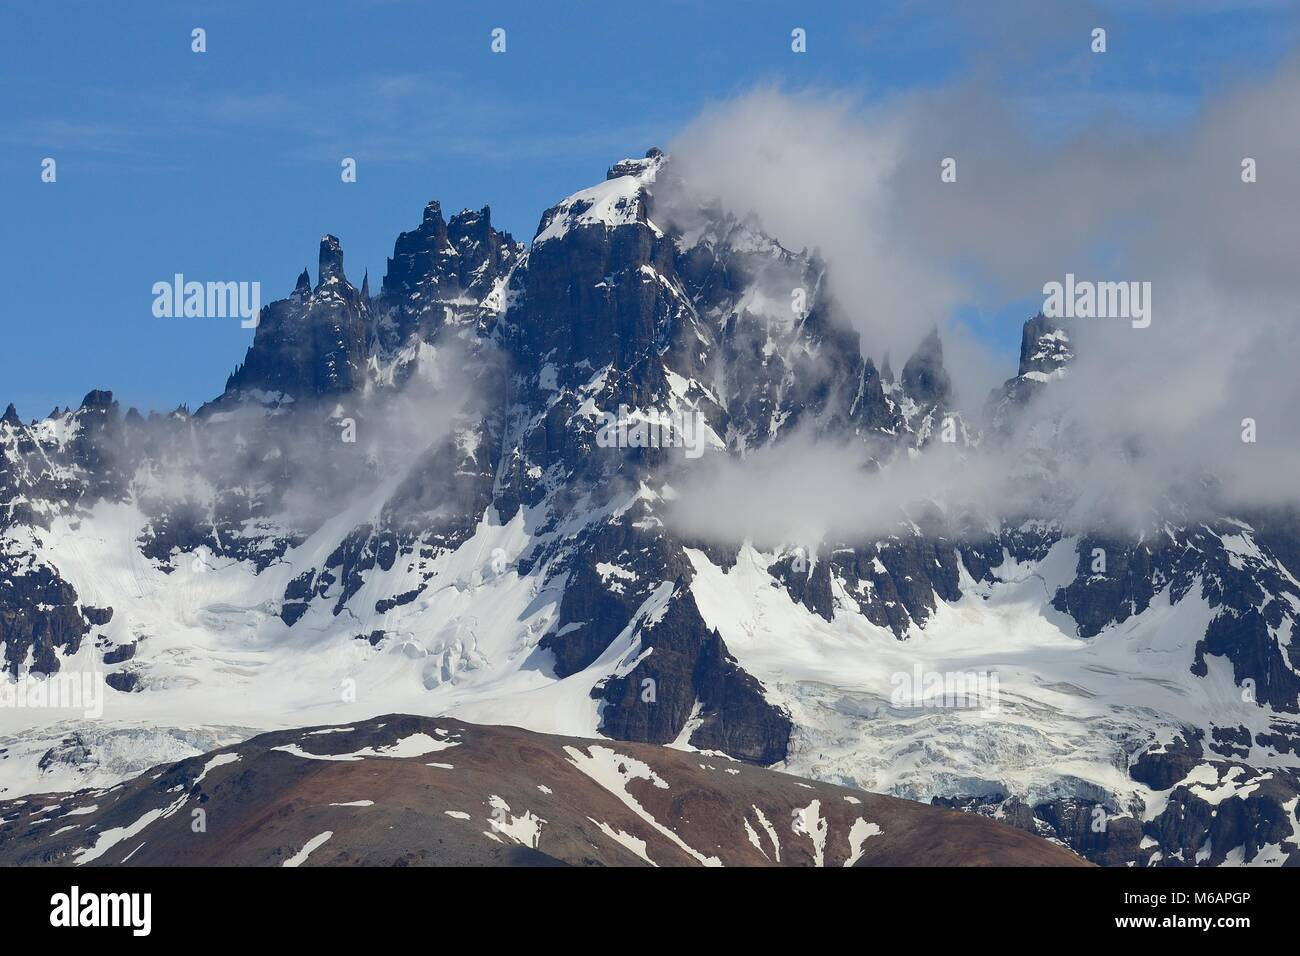 Cerro Castillo with clouds, Carretera Austral, near Villa Cerra Castillo, Región de Aisén, Chile - Stock Image